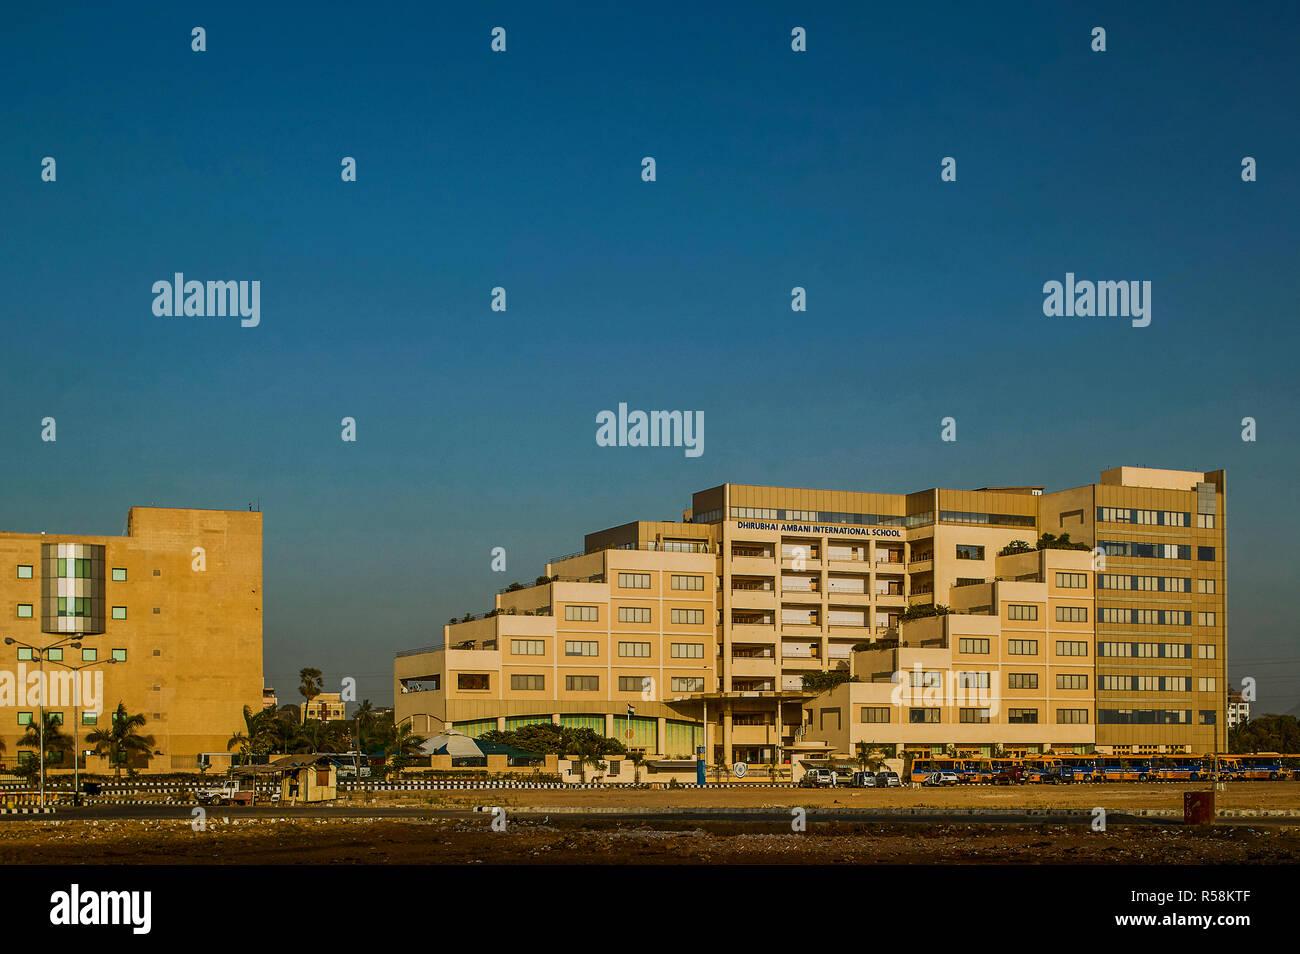 21 Apr 2004 Dhiru Bhai Ambani School Bandra Kurla Complex , Bombay Mumbai , Maharashtra , India asia - Stock Image